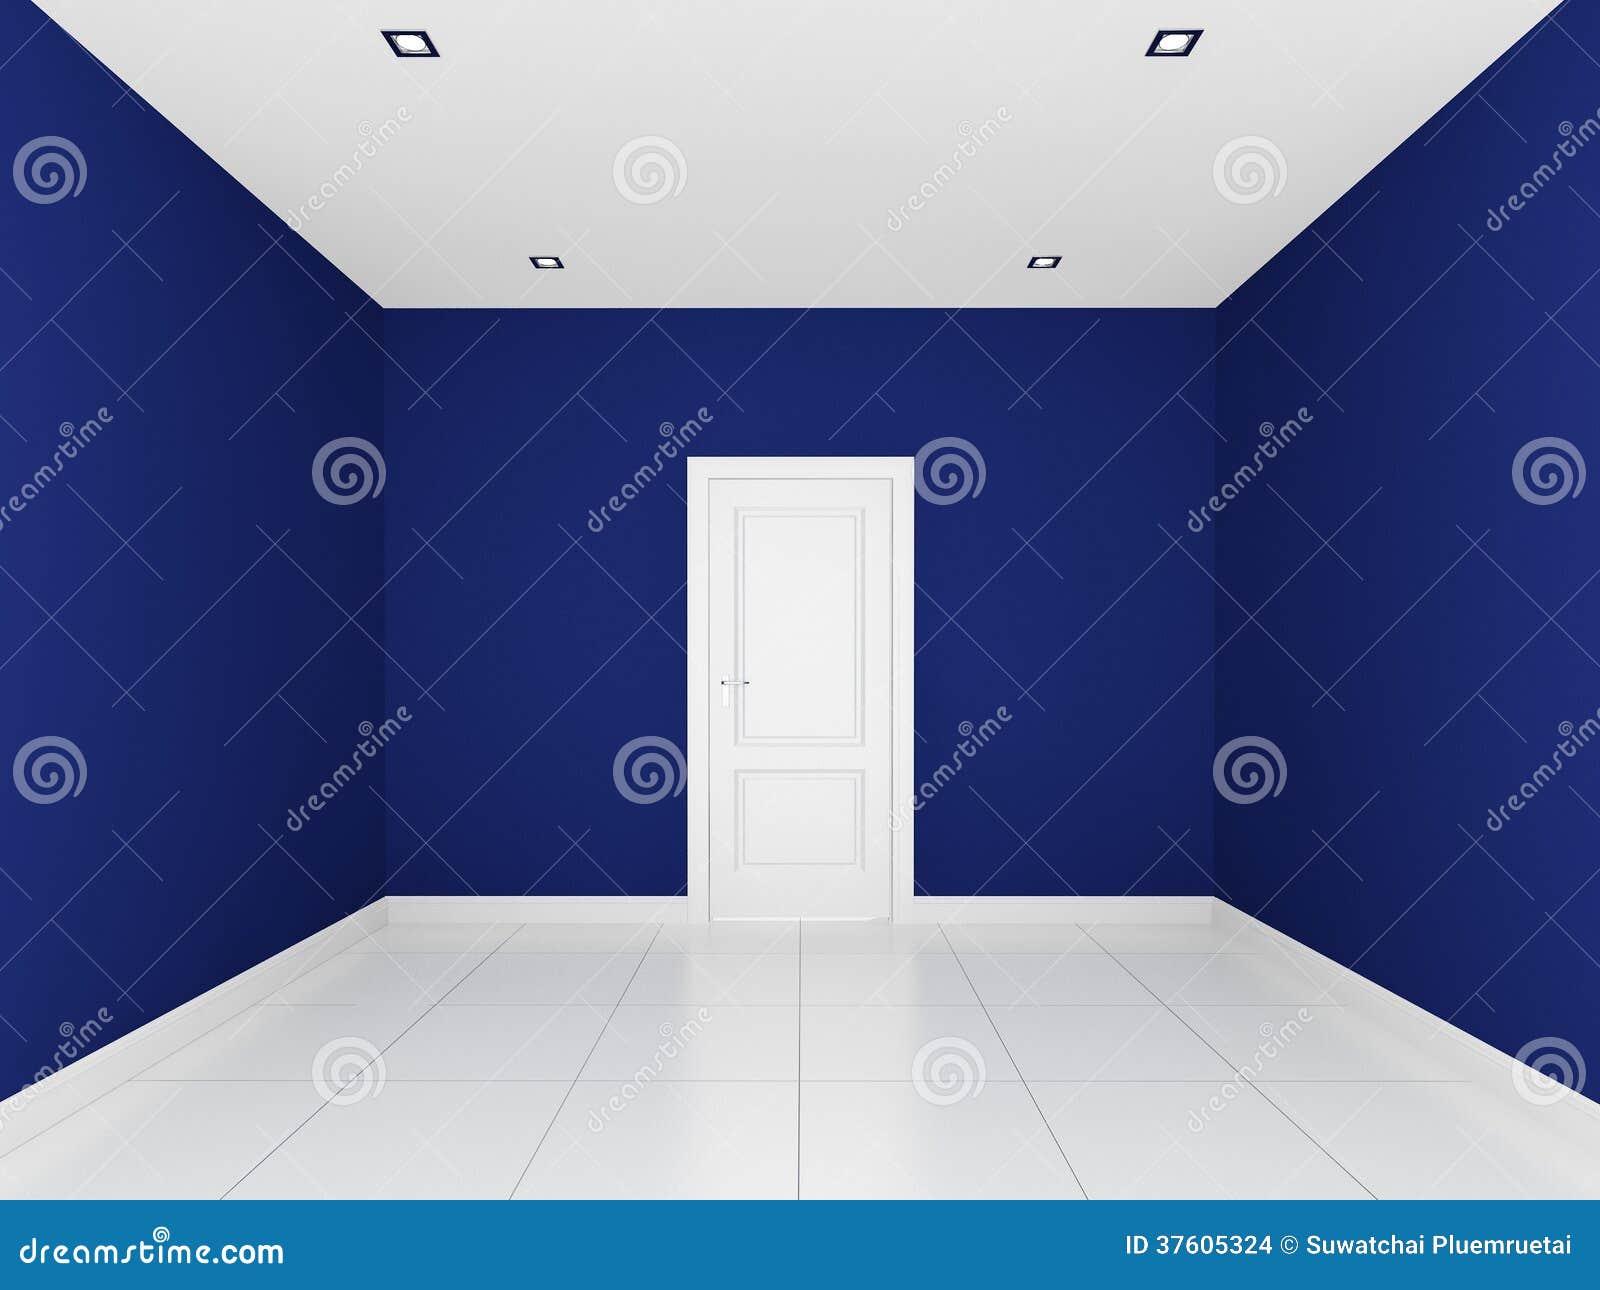 uppsala 074 kreideemulsion kreidefarbe blau wand und